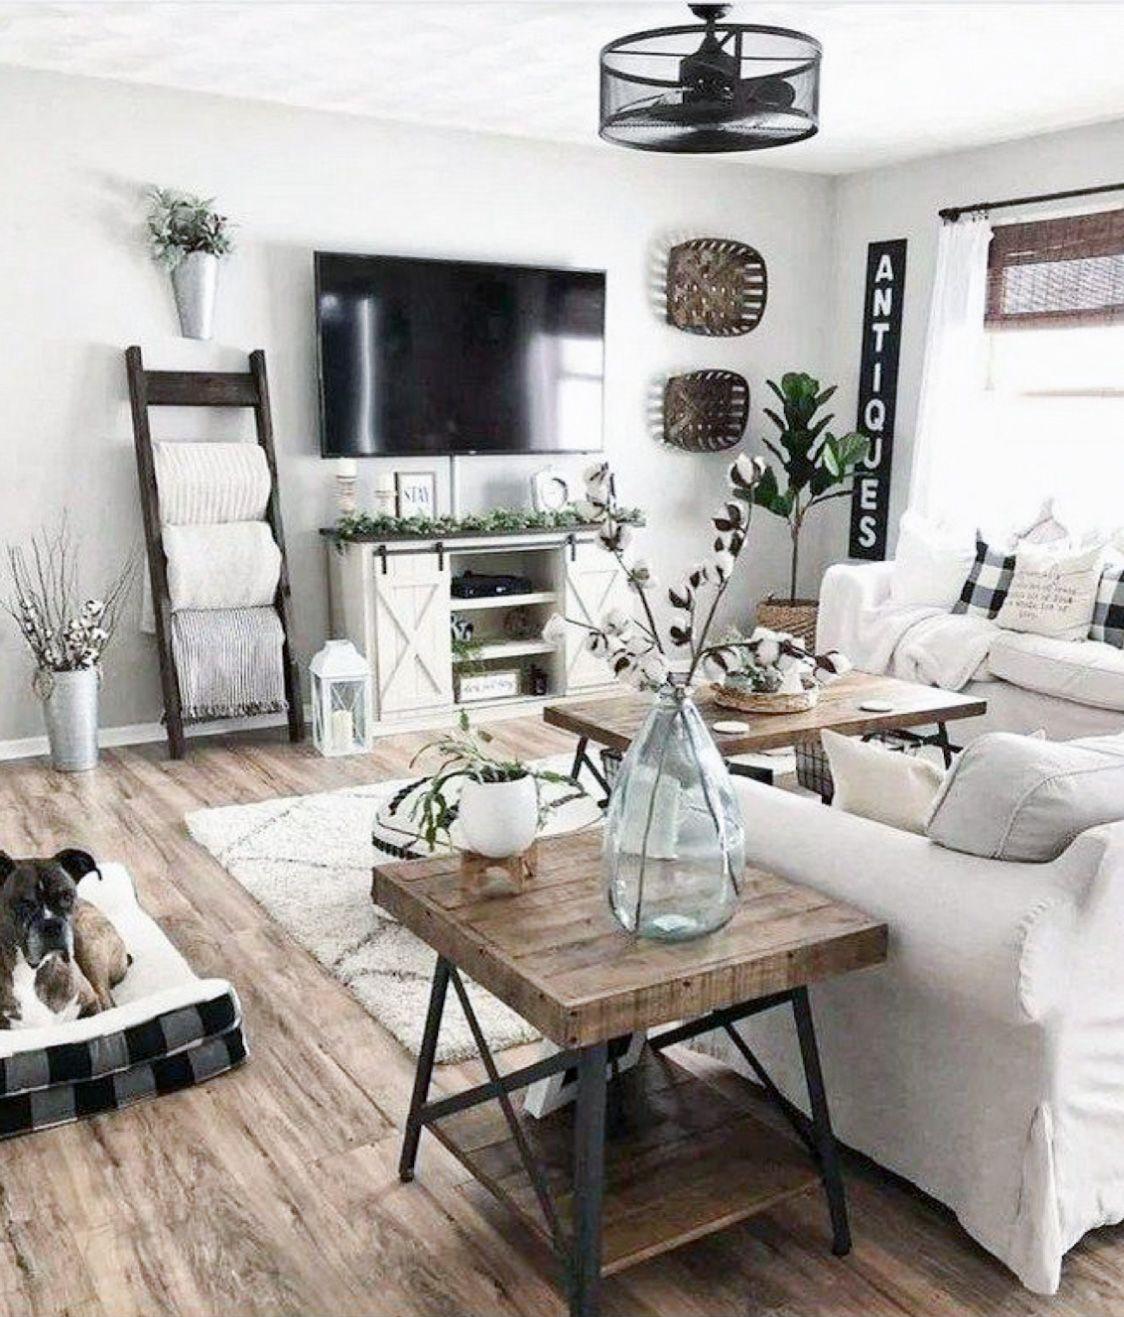 The Most Gorgeous Diy Farmhouse Decor And Furniture Diy Darlin In 2020 Farmhouse Decor Living Room Farm House Living Room Small Space Living Room